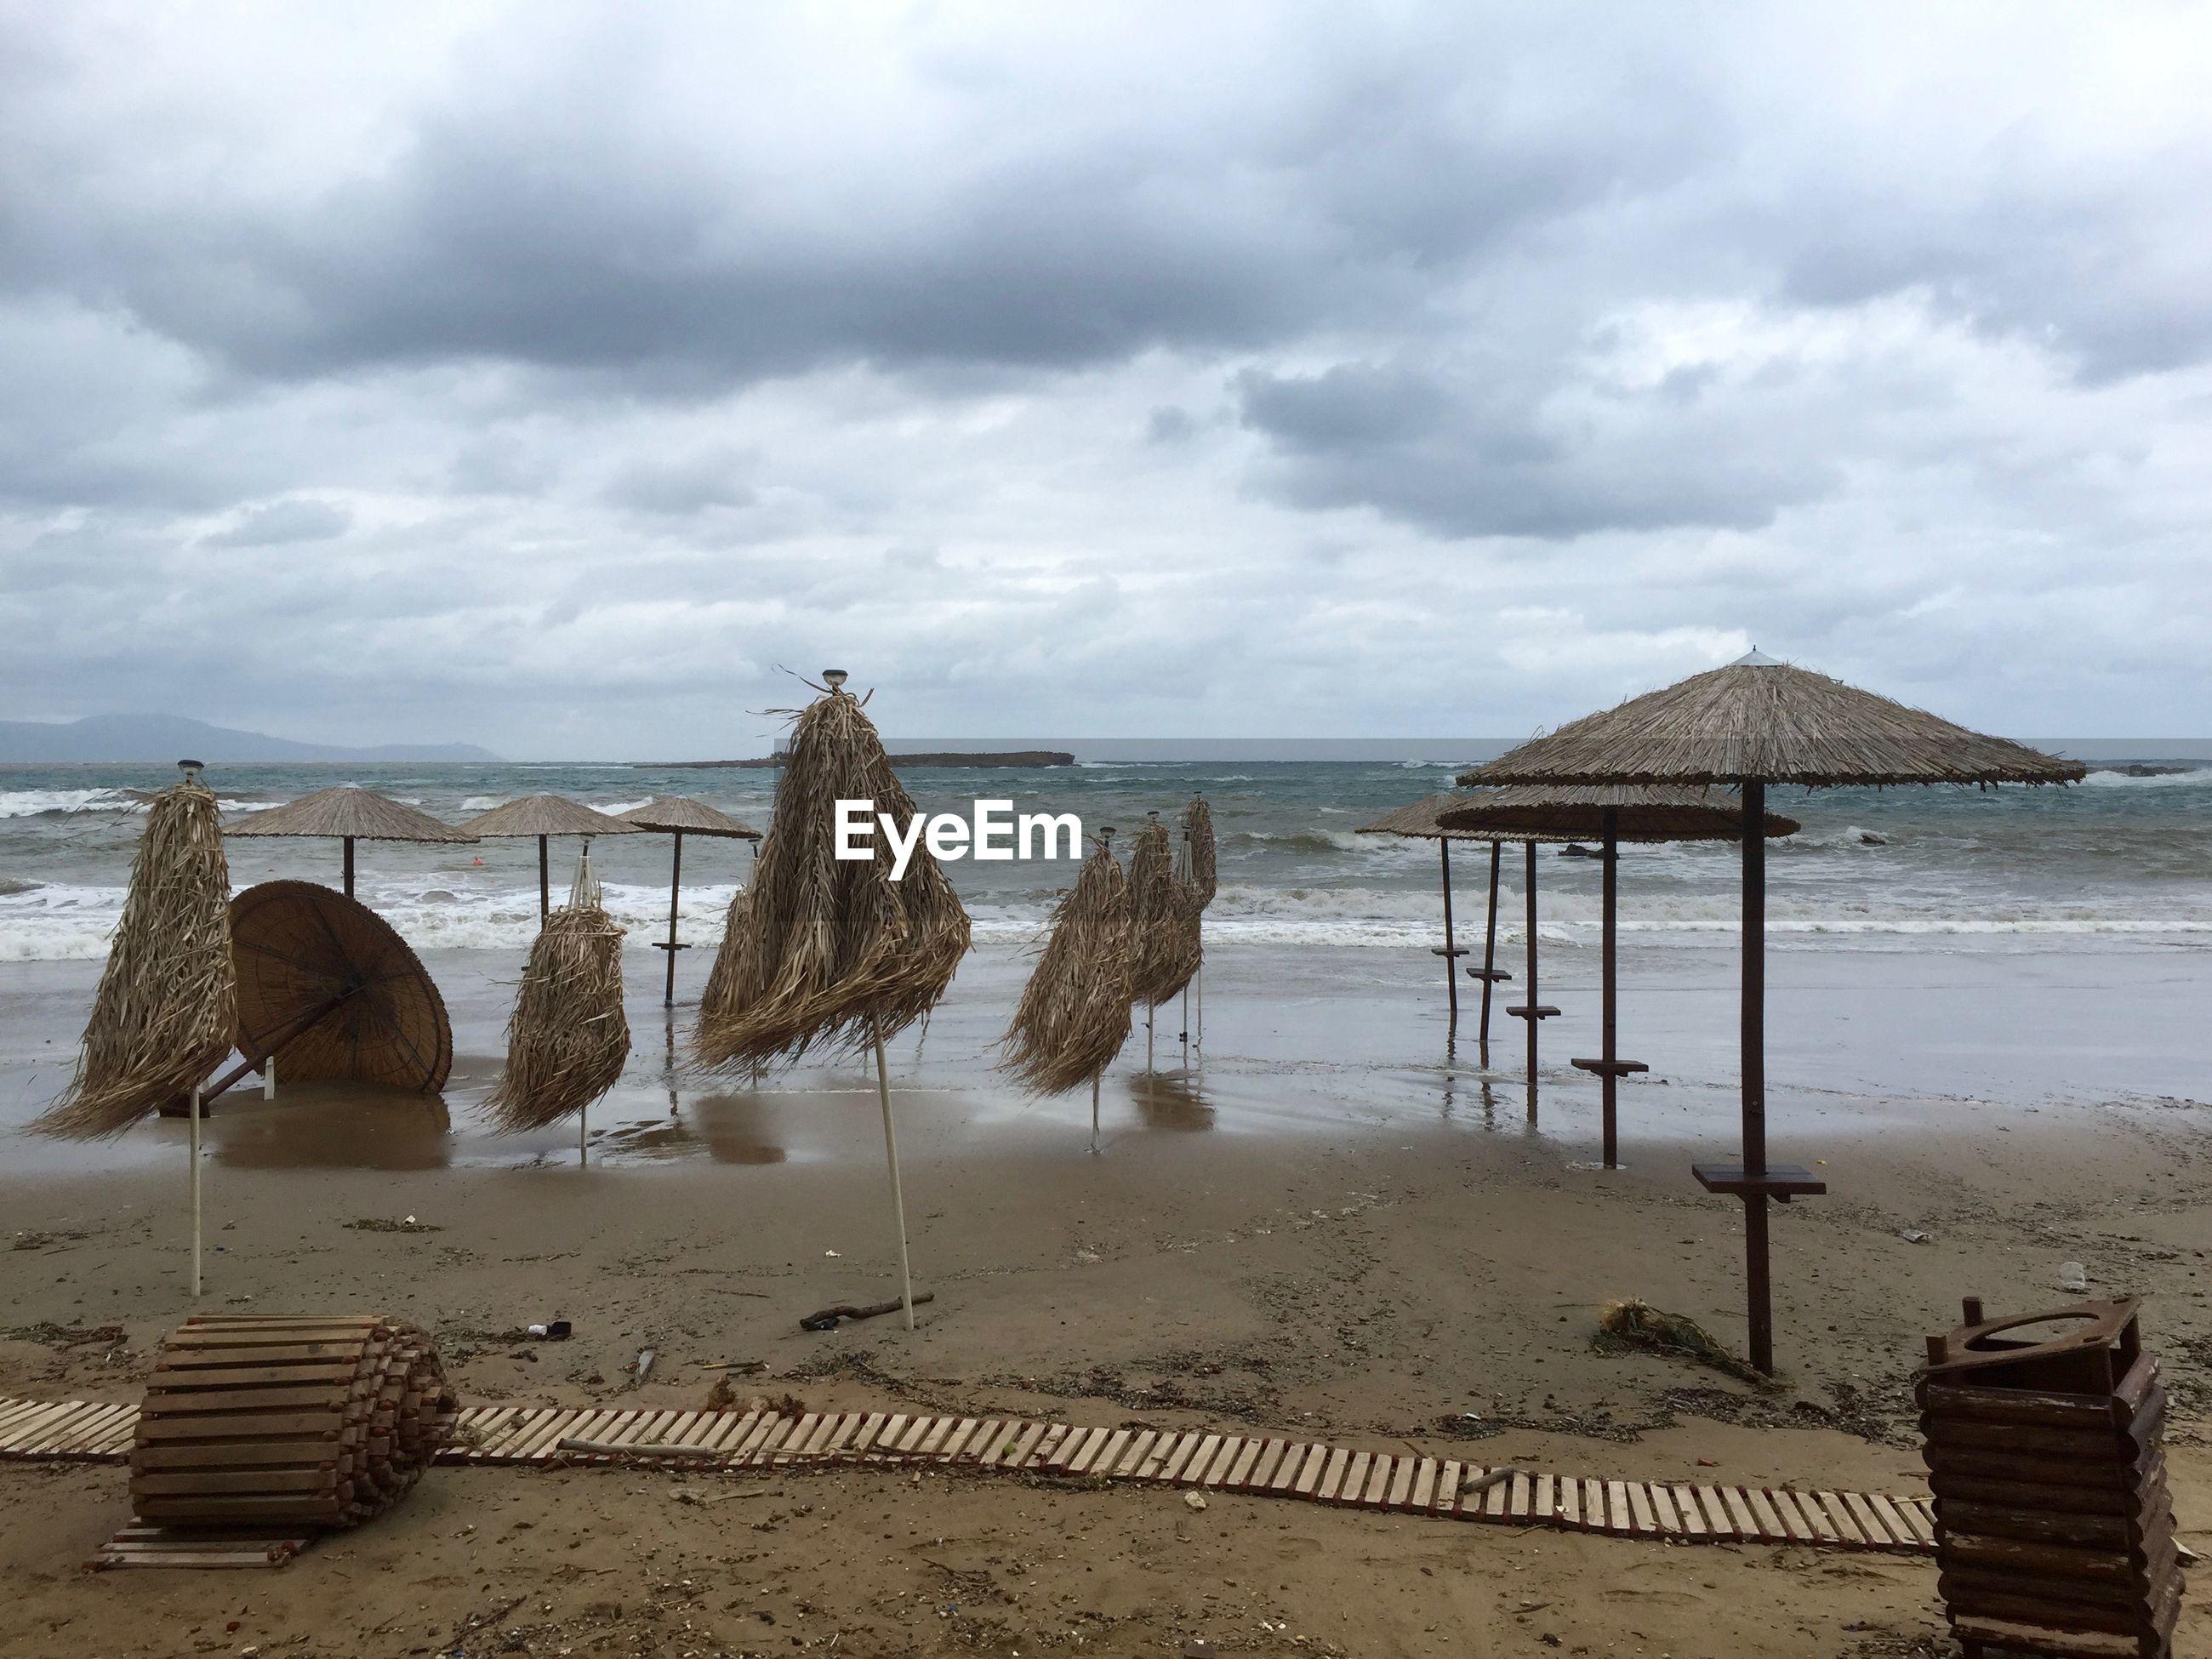 GAZEBO ON BEACH AGAINST SKY